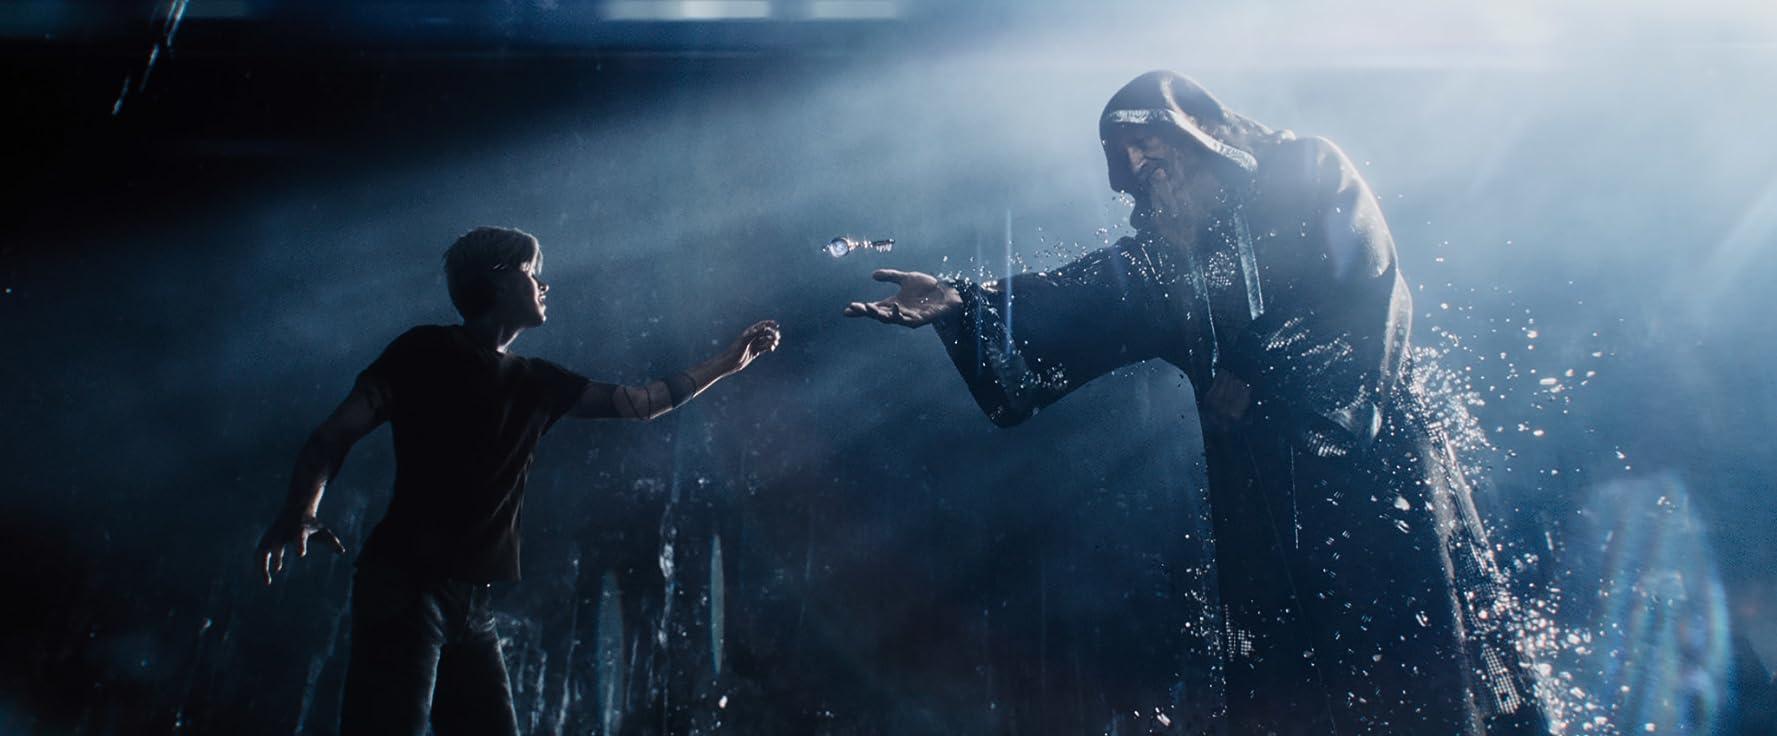 Mark Rylance and Tye Sheridan in Ready Player One (2018)